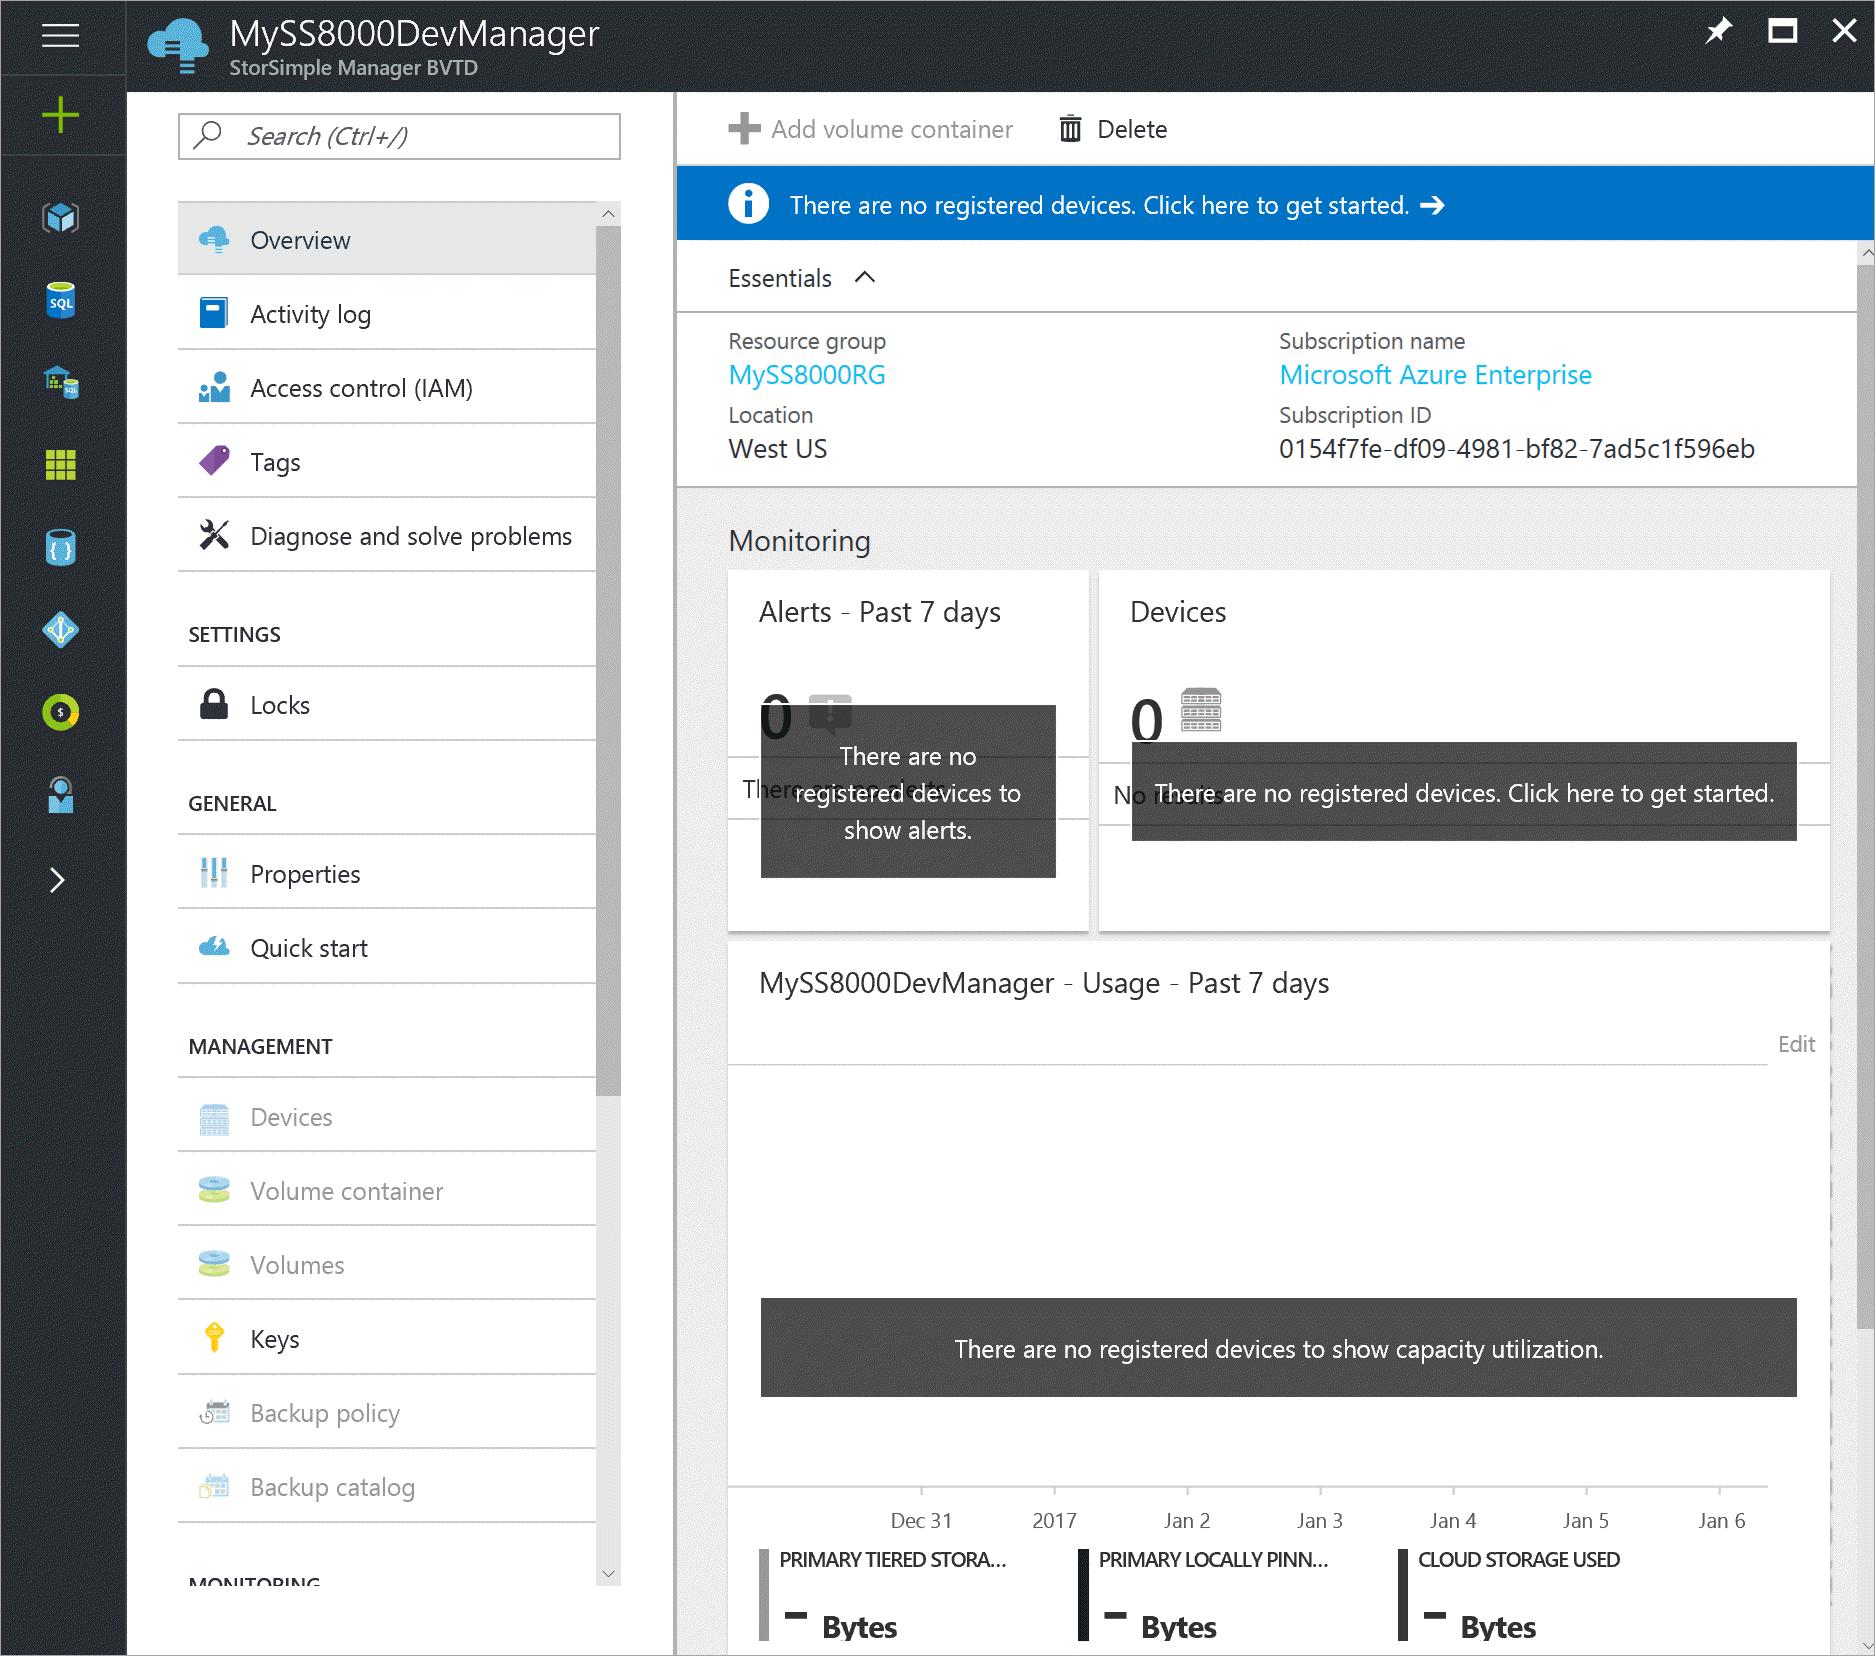 Connect manager - internete erişiminiz